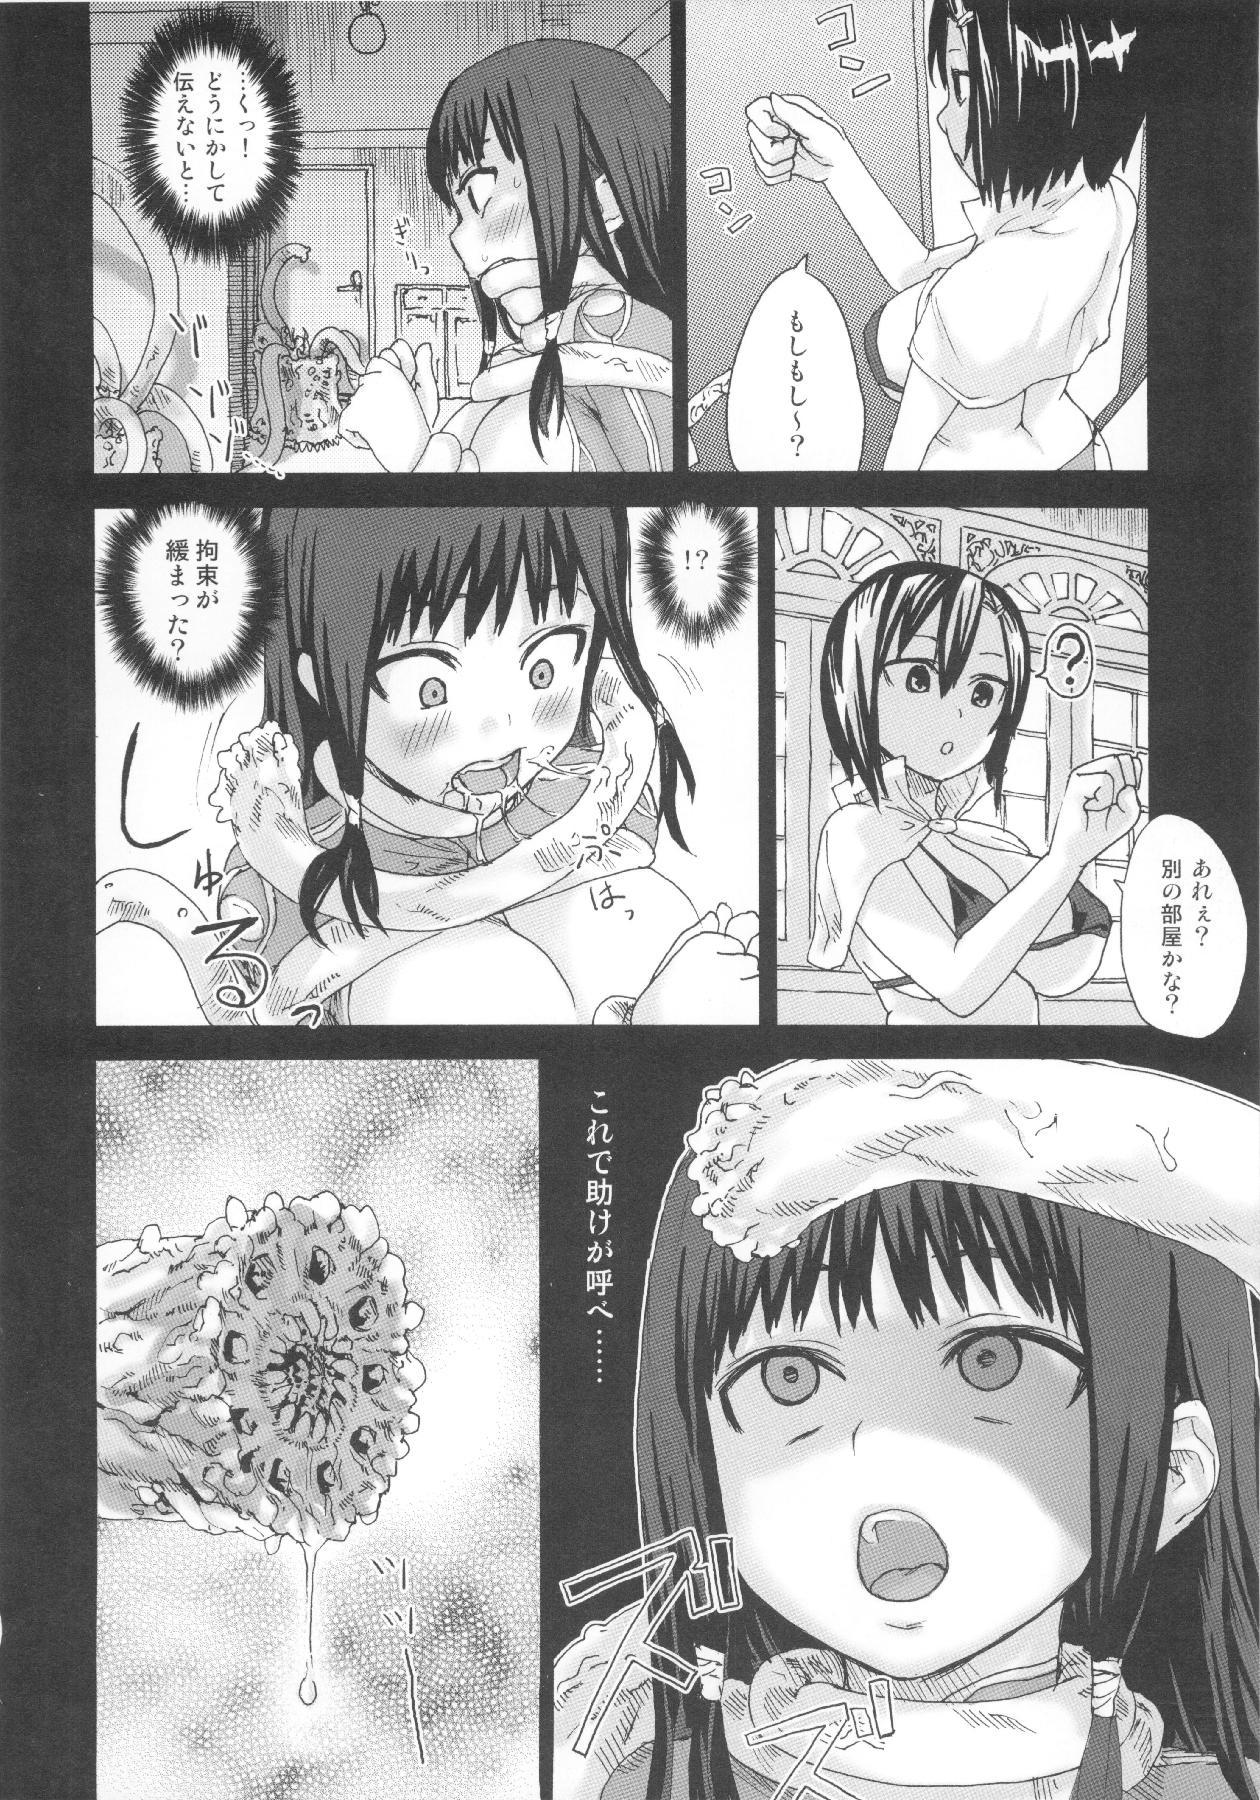 (C83) [Fatalpulse (Asanagi)] VictimGirls Compiled Vol.1 -Victimgirls Soushuuhen 1- MMO Game Selection (Various) 90